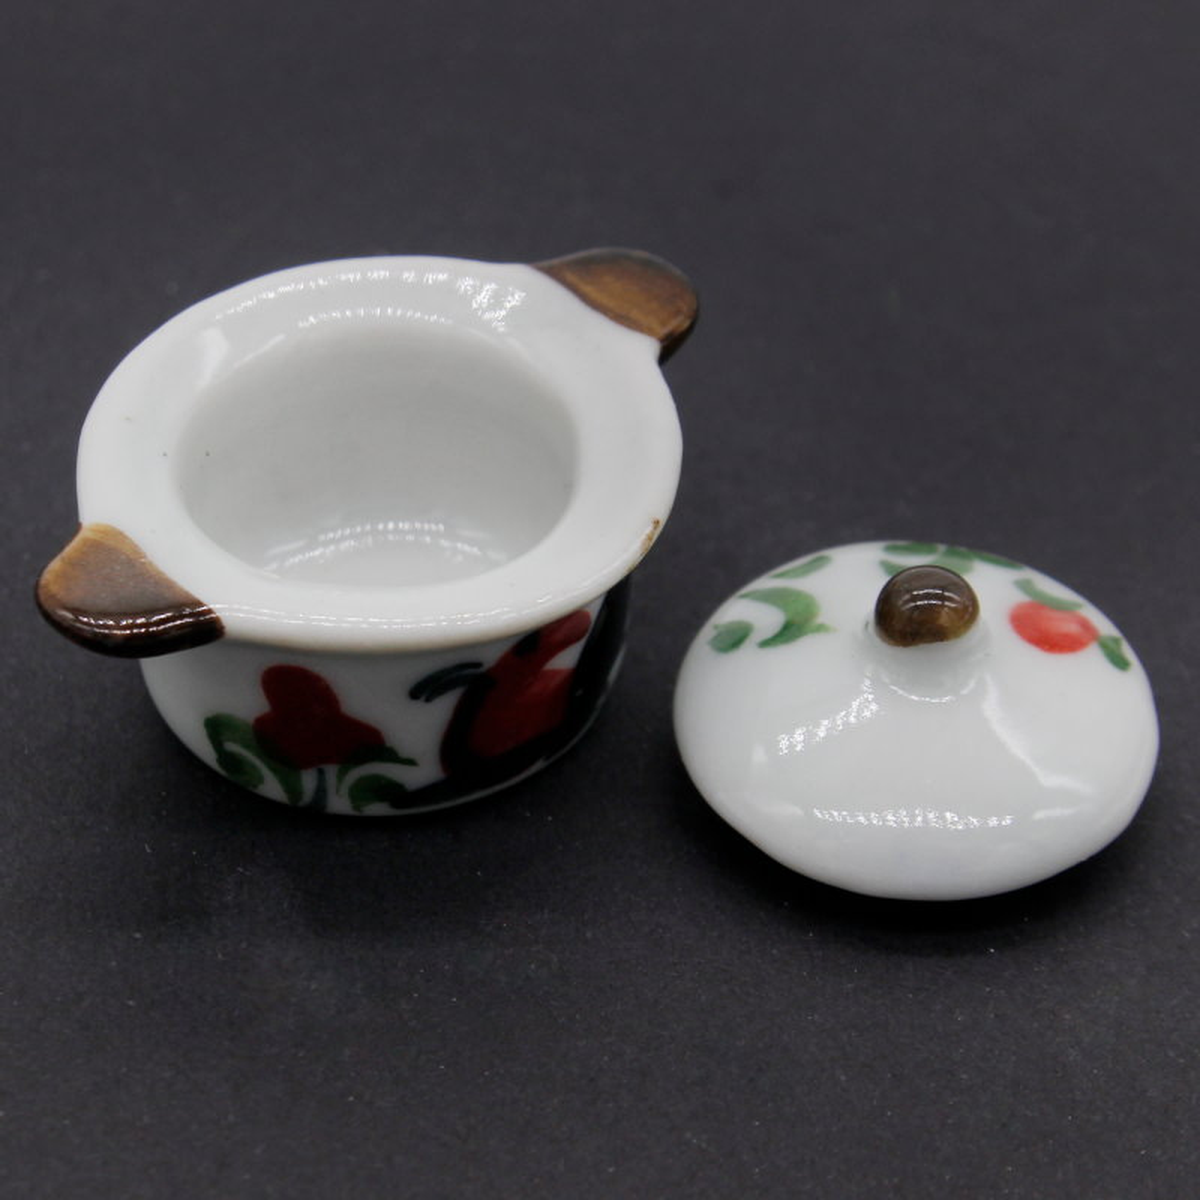 Miniature Printed Ceramic Kitchen Set